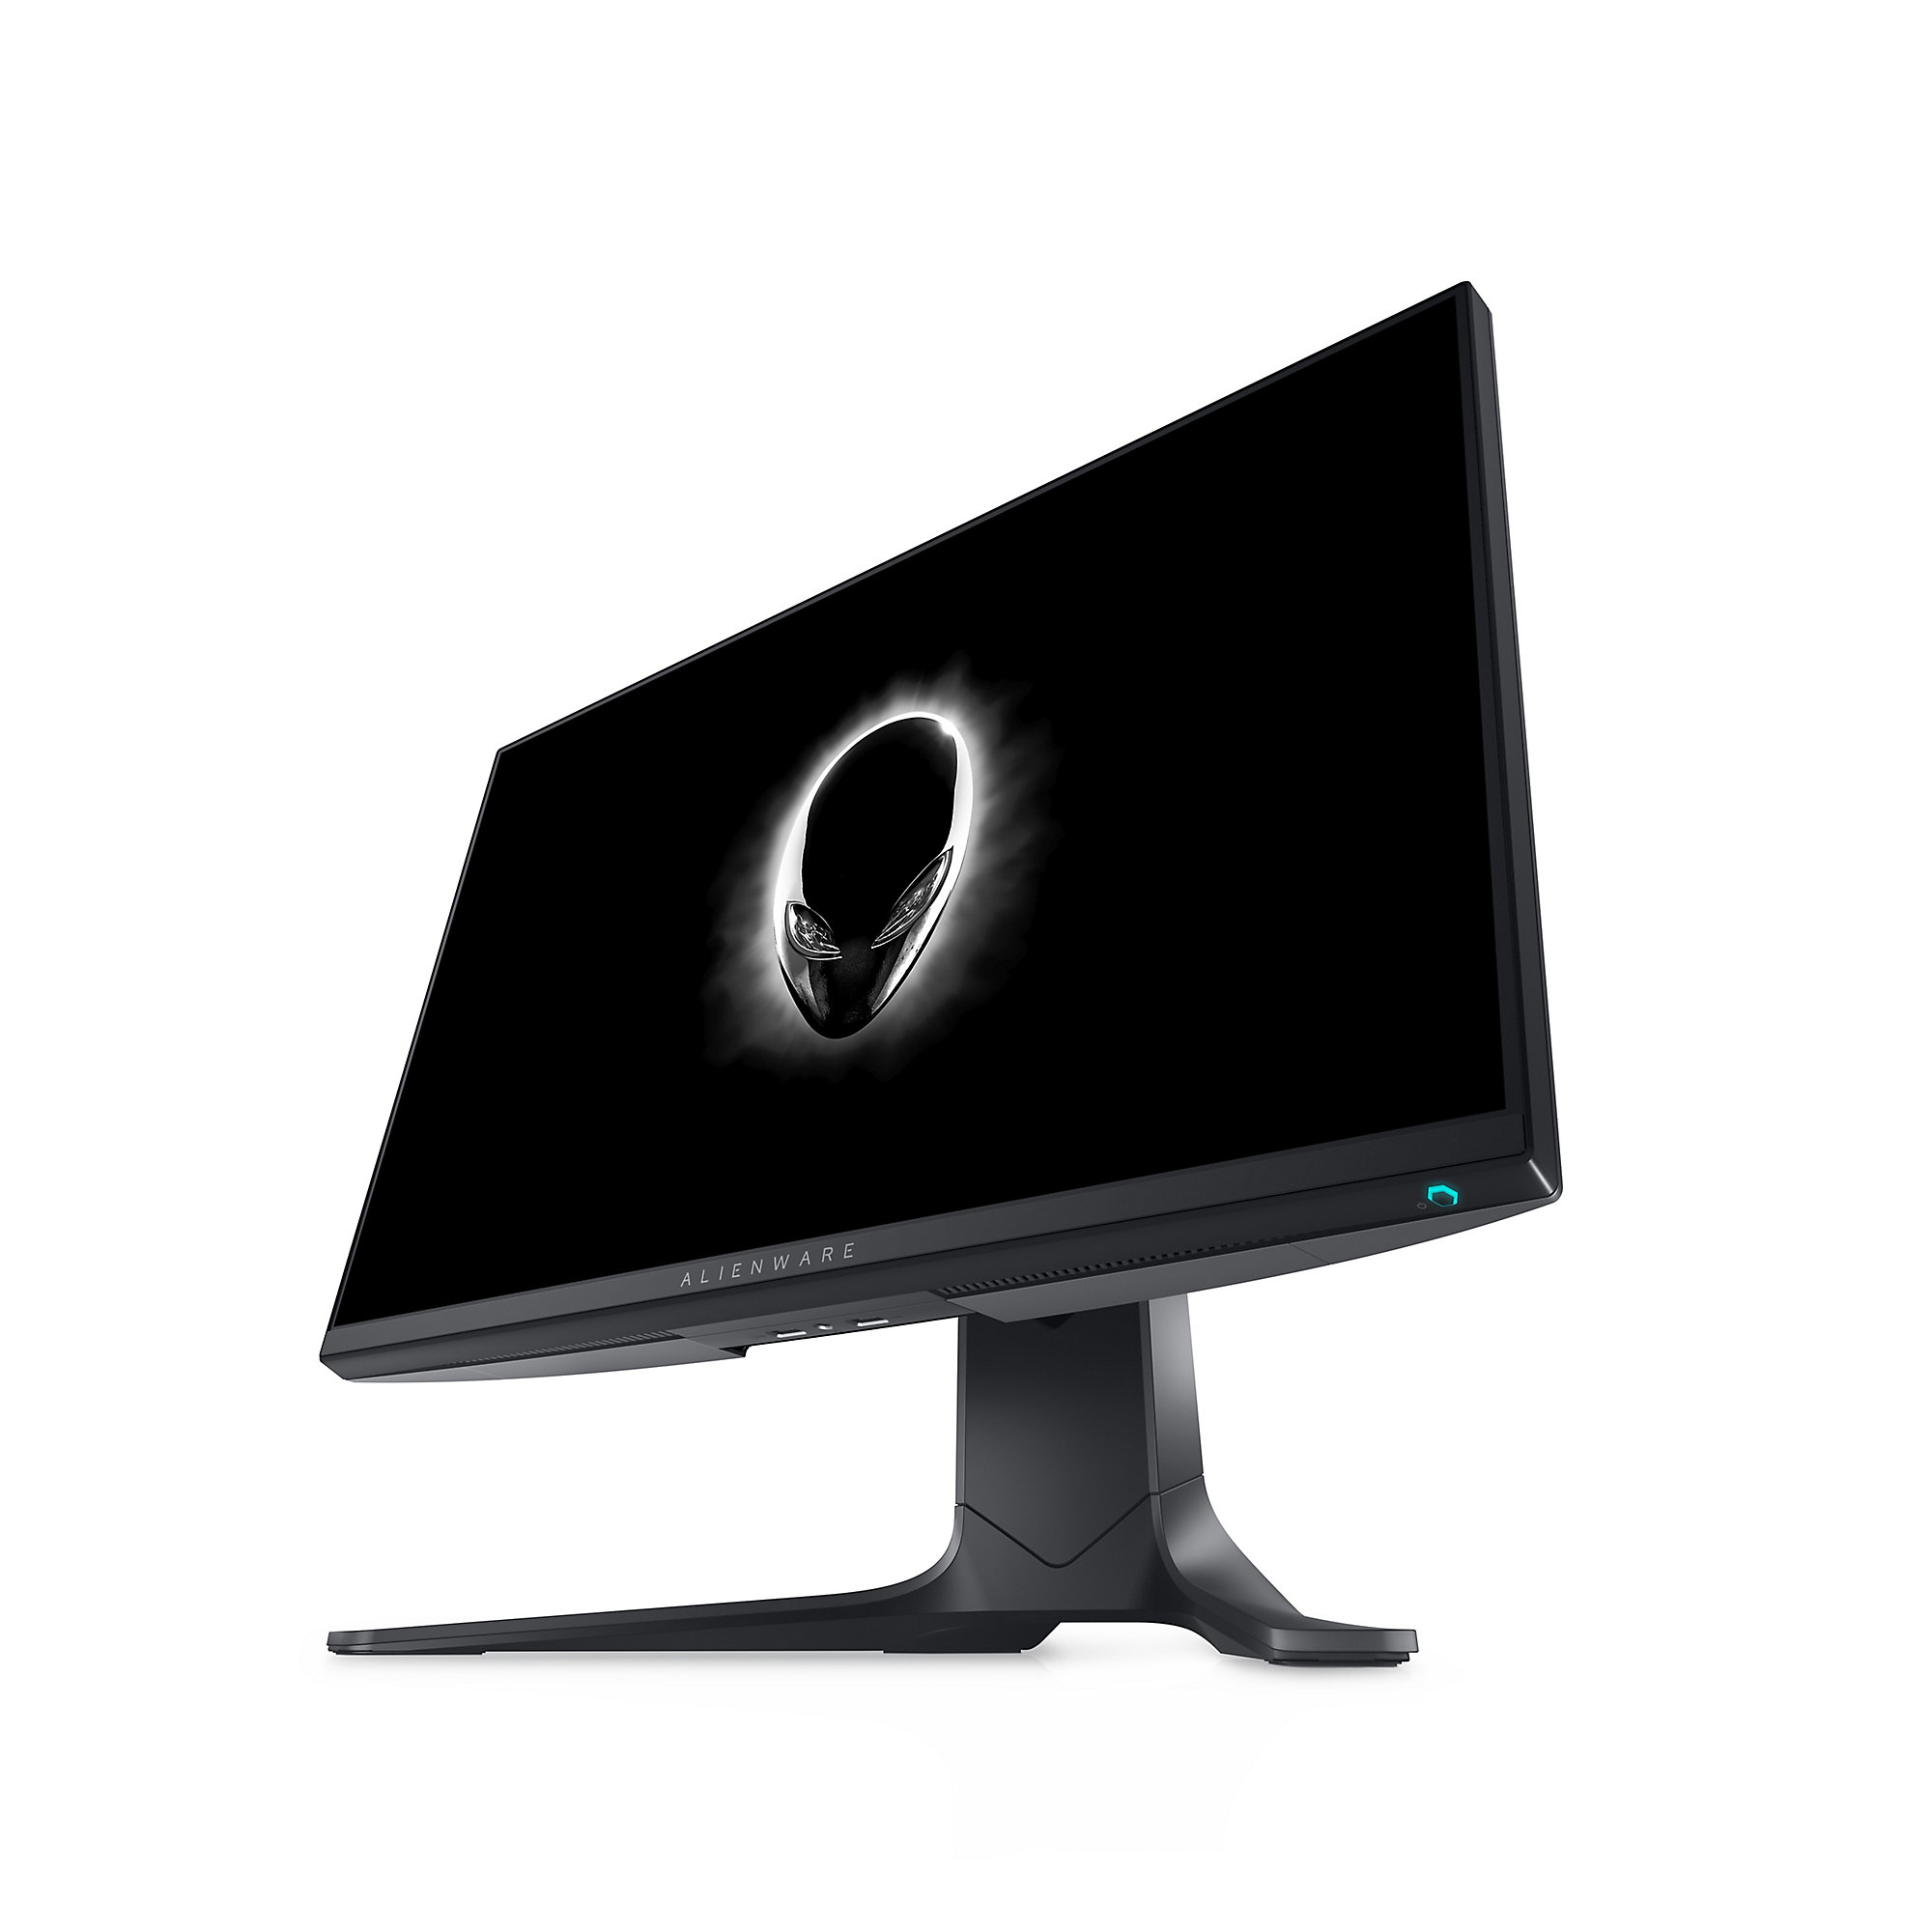 "ALIENWARE AW2521HFL Full HD 24.5"" LED Gaming Monitor - White, White"